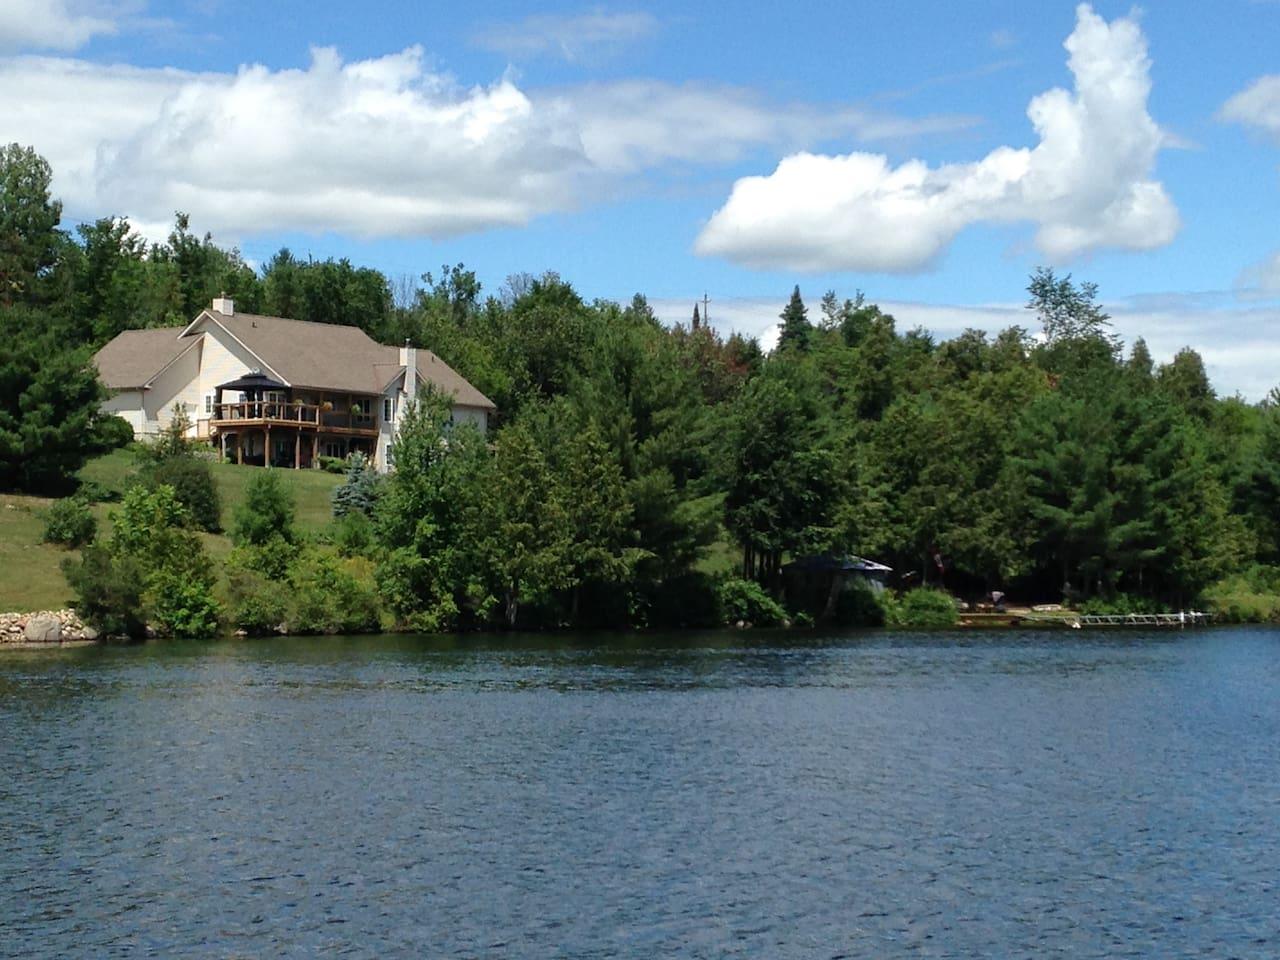 Located on the beautiful Madawaska River